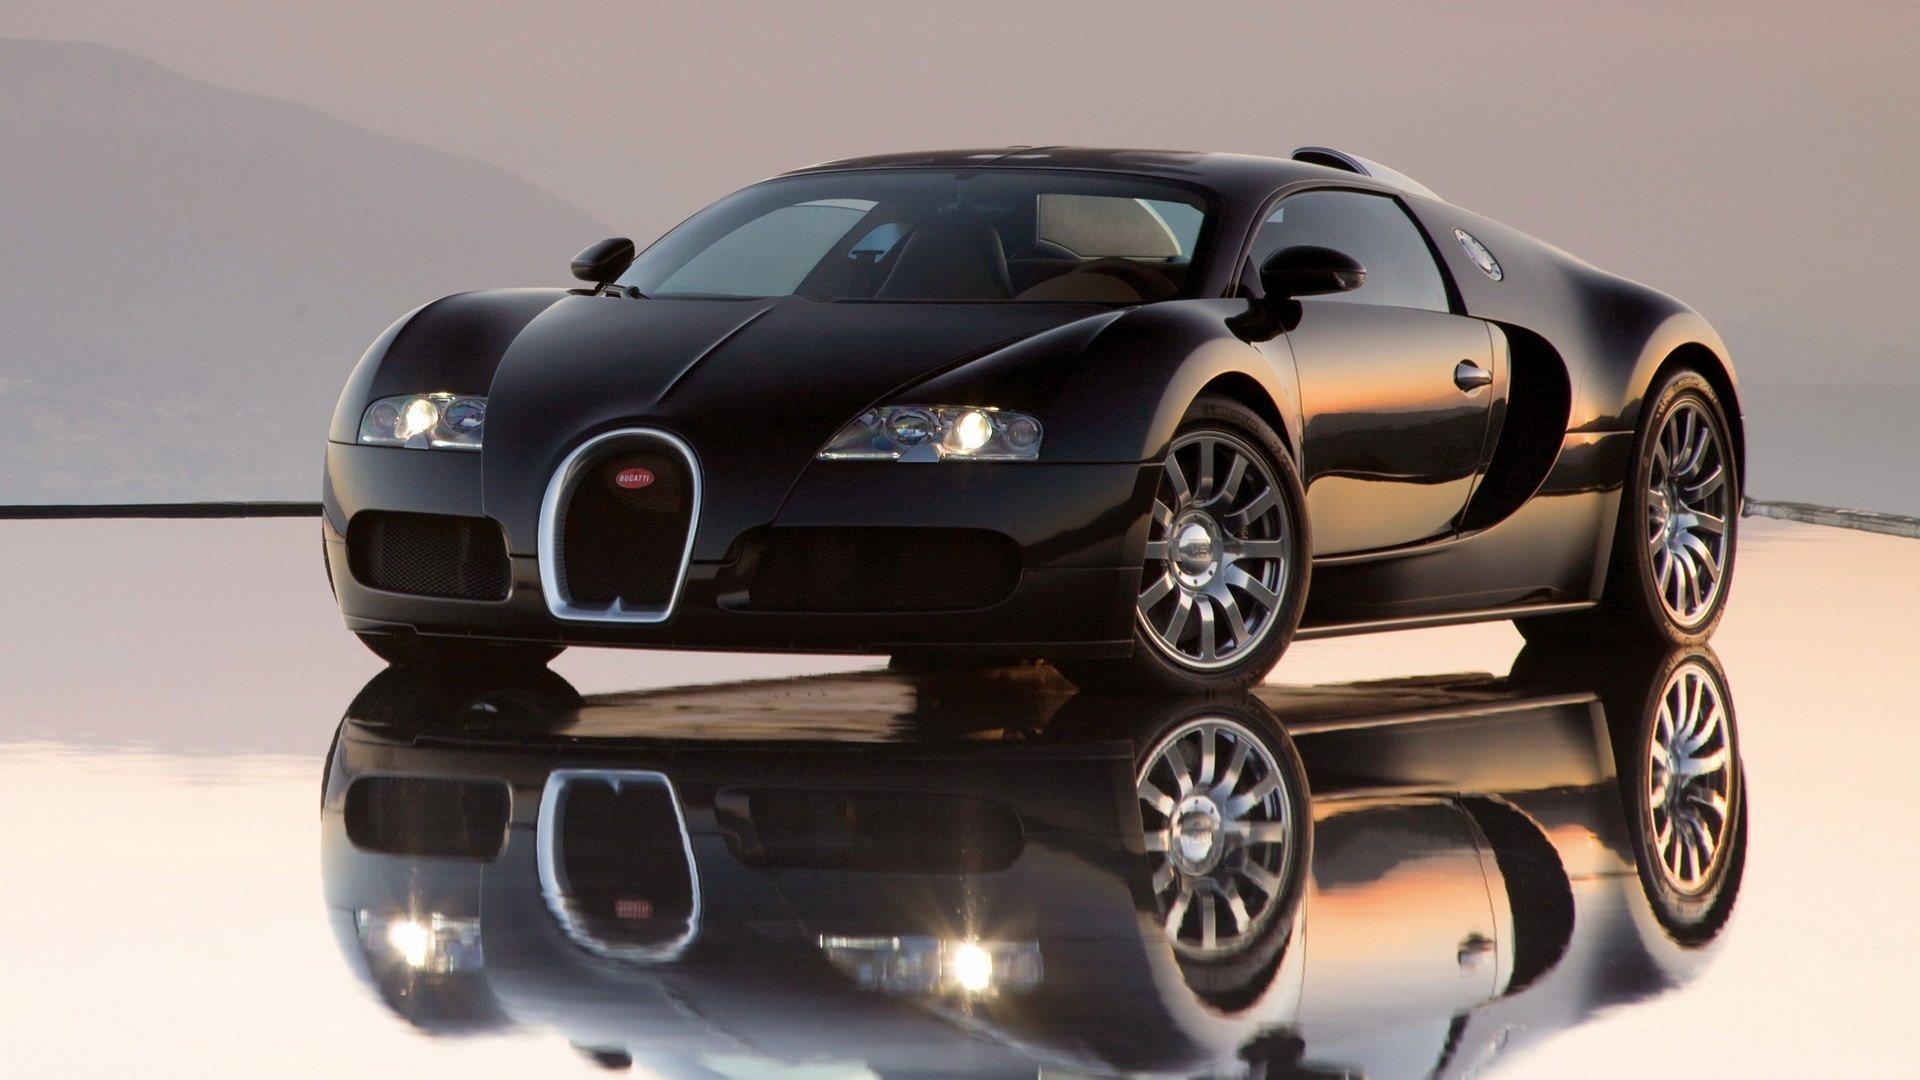 Description Black Bugatti Veyron is a hi res Wallpaper for pc 1920x1080